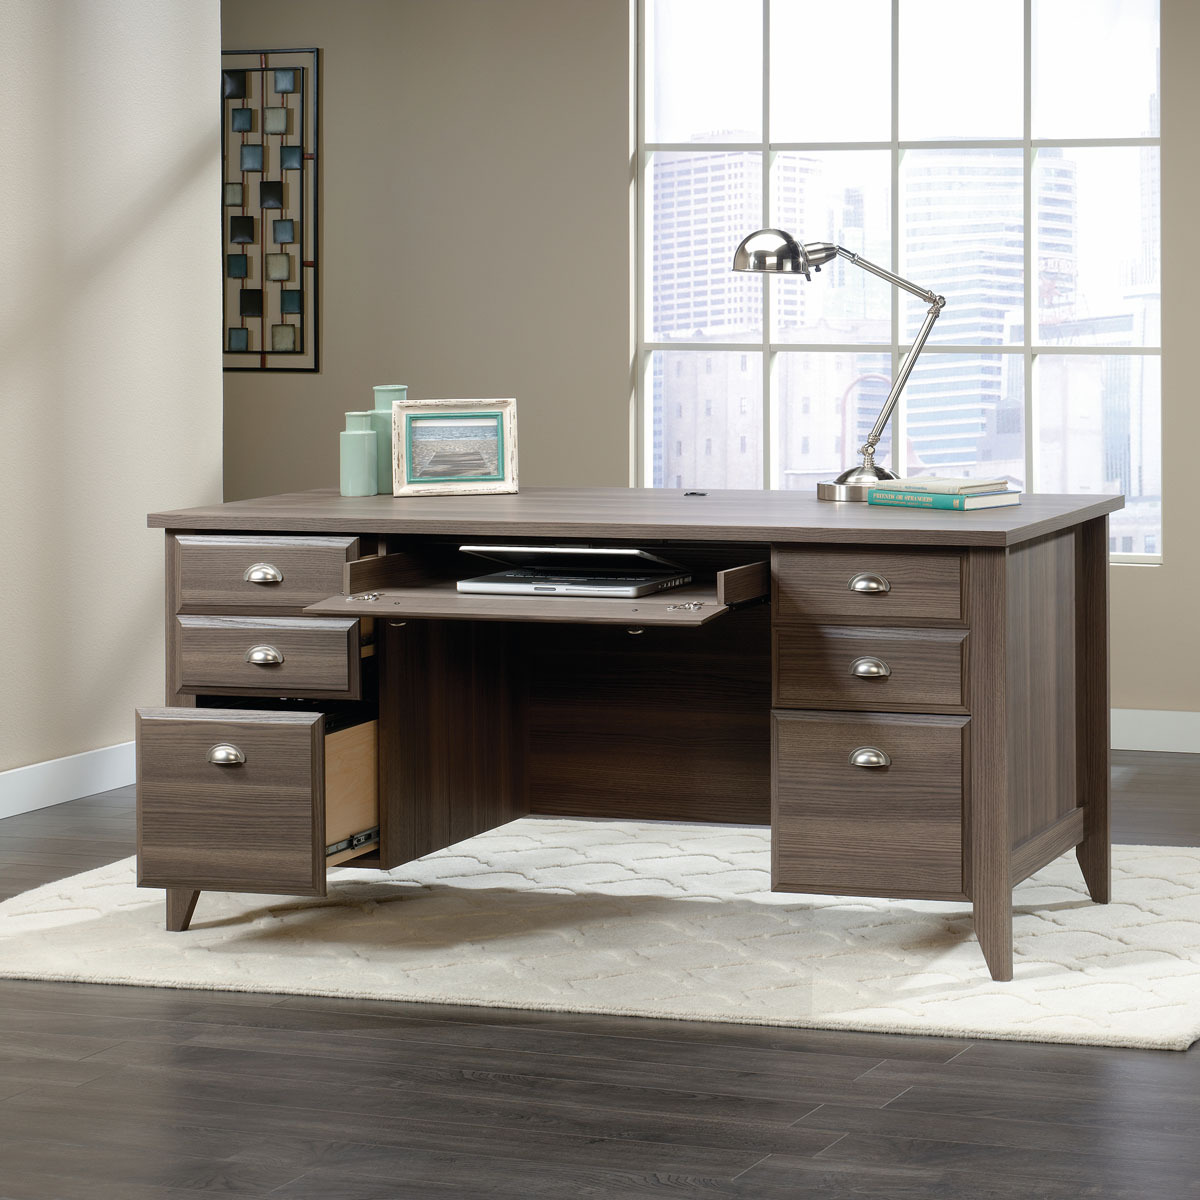 Sauder Shoal Creek Executive Desk 418656